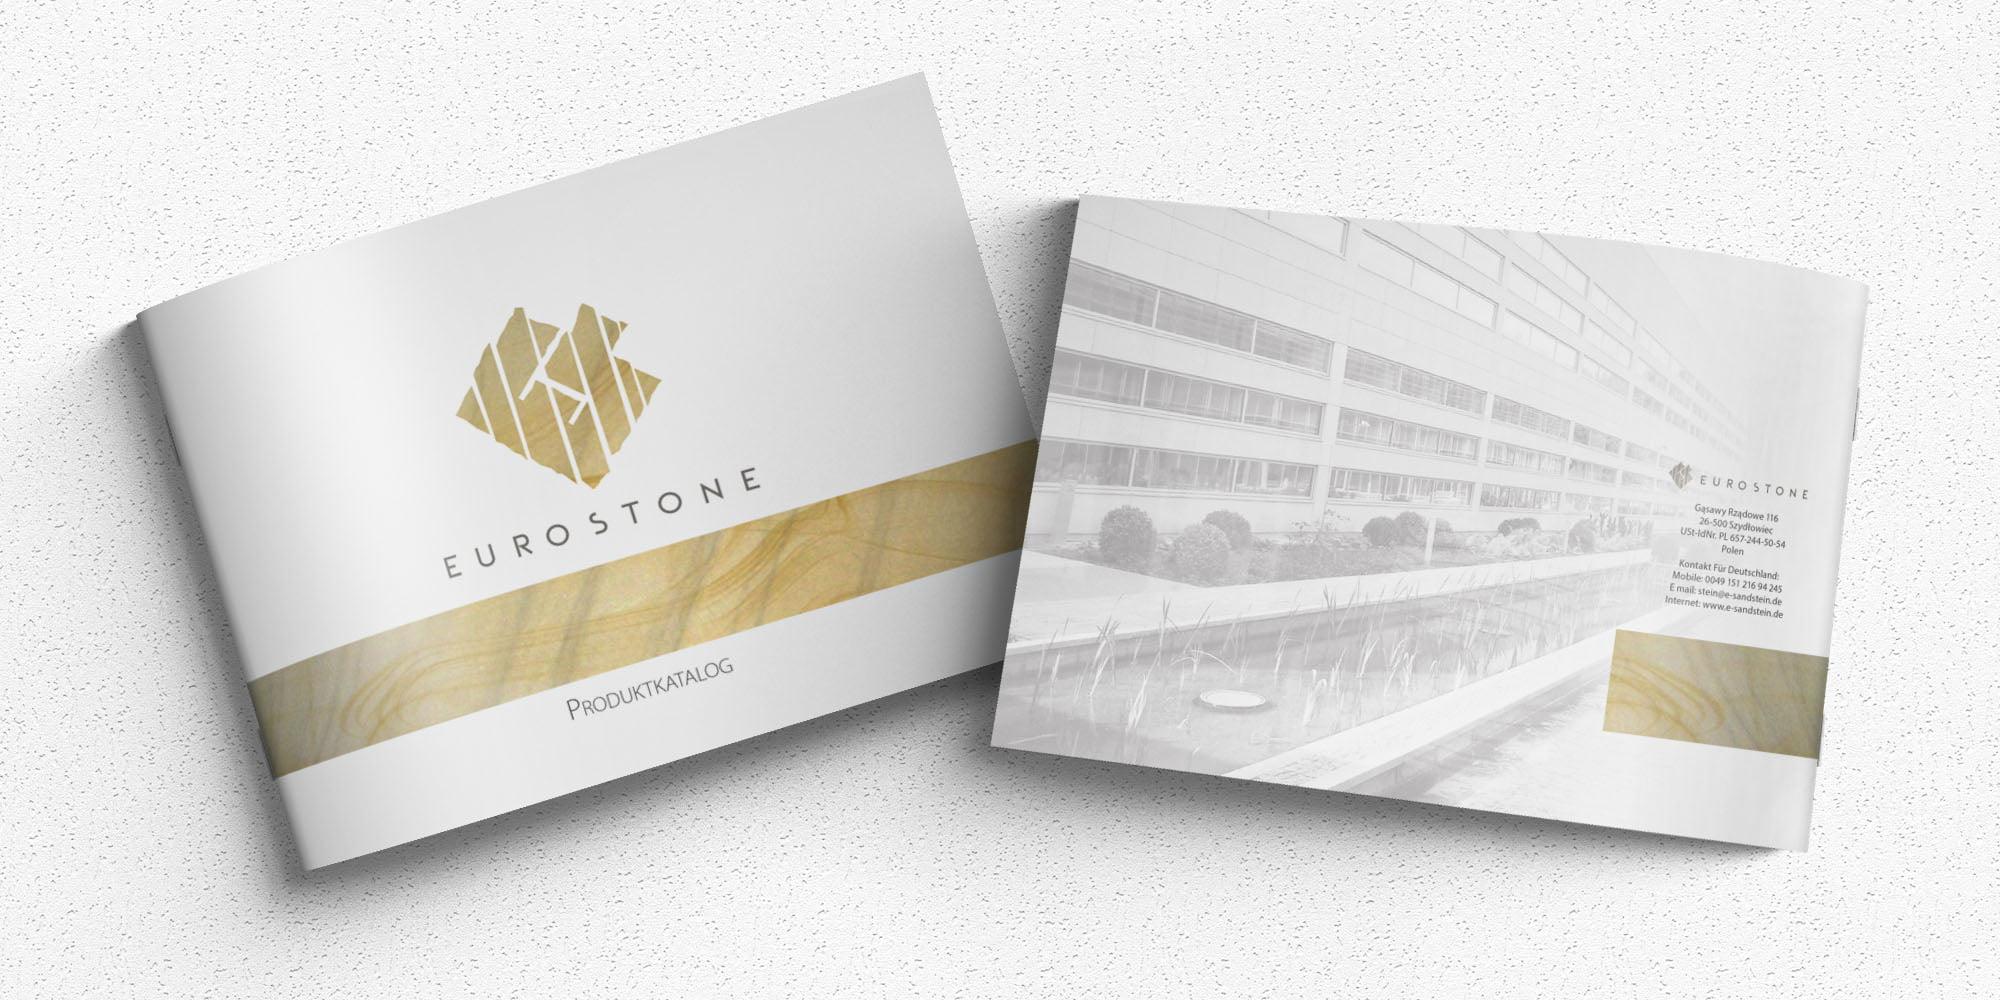 Katalog A5 Eurostone Realizacja Sto15.pl Autor: Piotr Ratuski